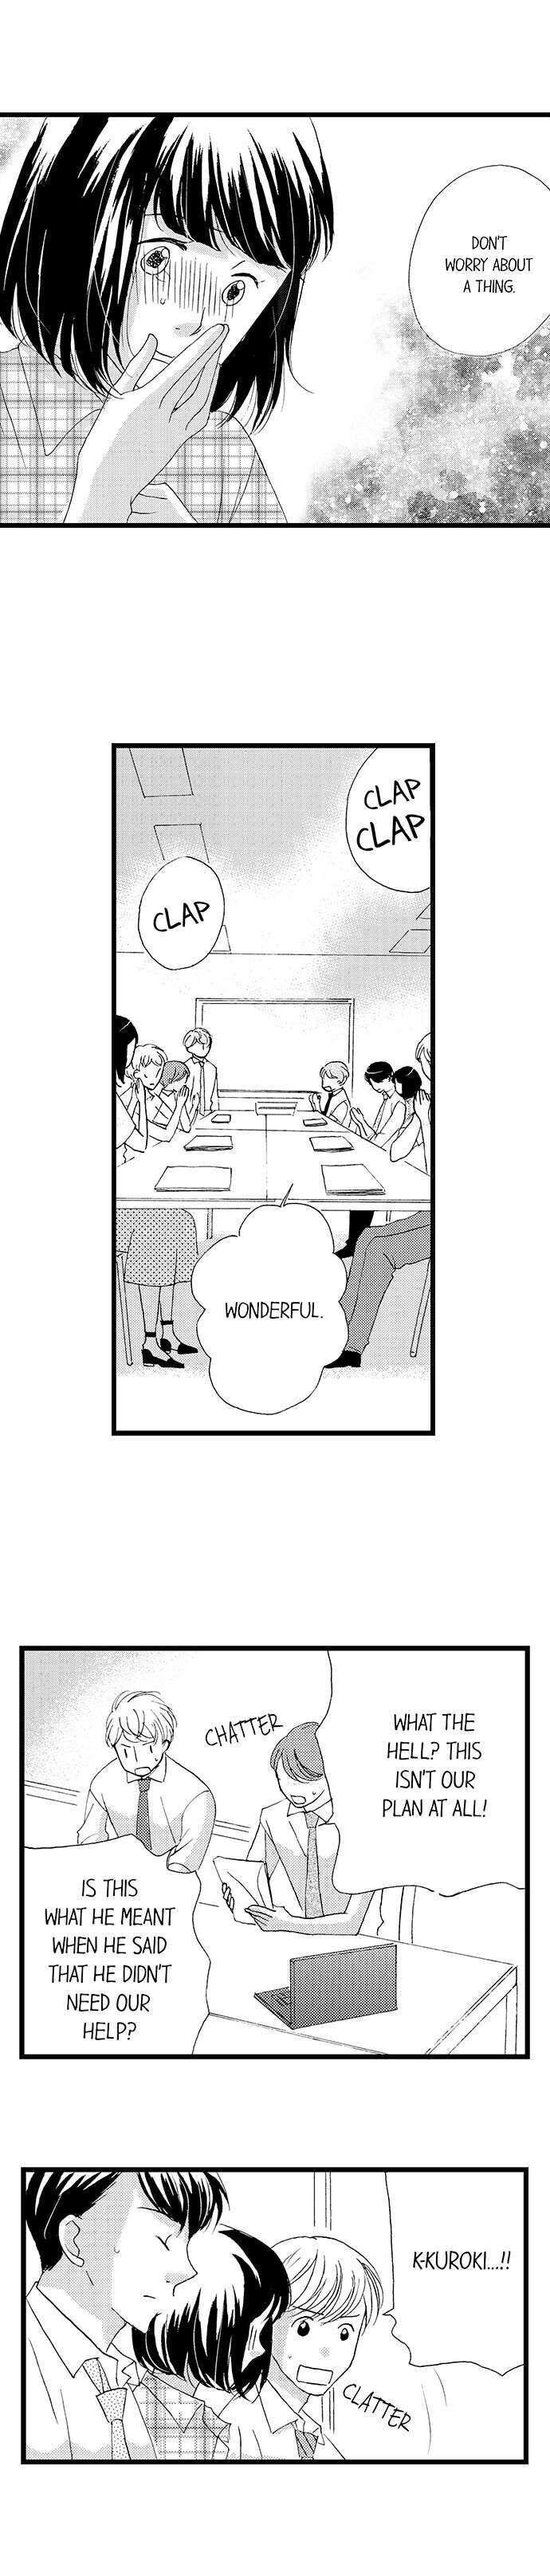 Amaku Nureru Uso Kekkon Toiu Na No Fukushu Chapter 64 page 6 - Mangakakalots.com